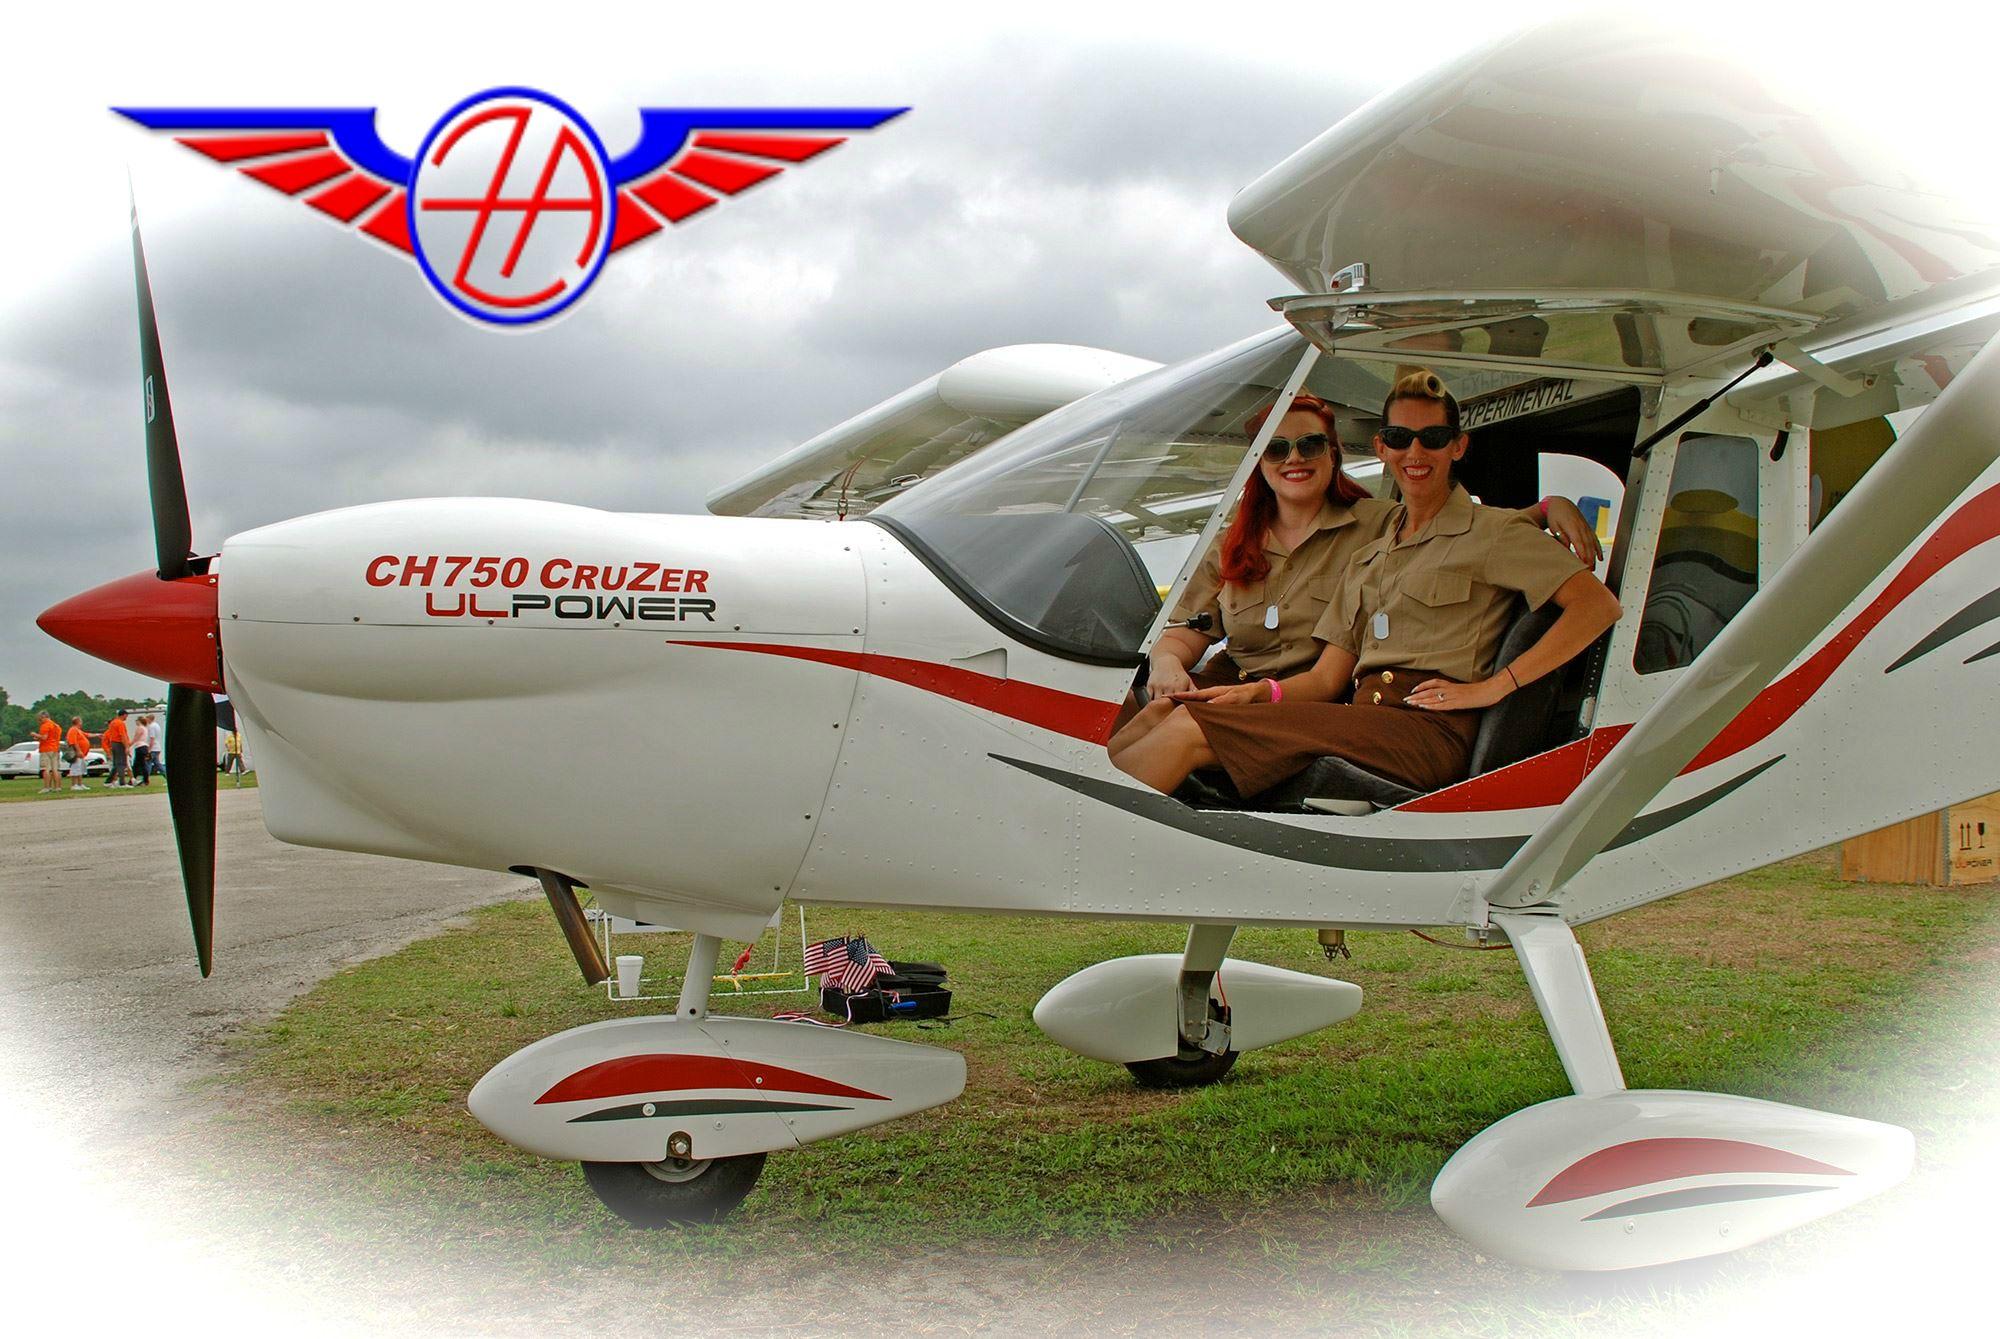 flygcforum com ✈ ZENITH AIRCRAFT COMPANY ✈ Homebuilt STOL